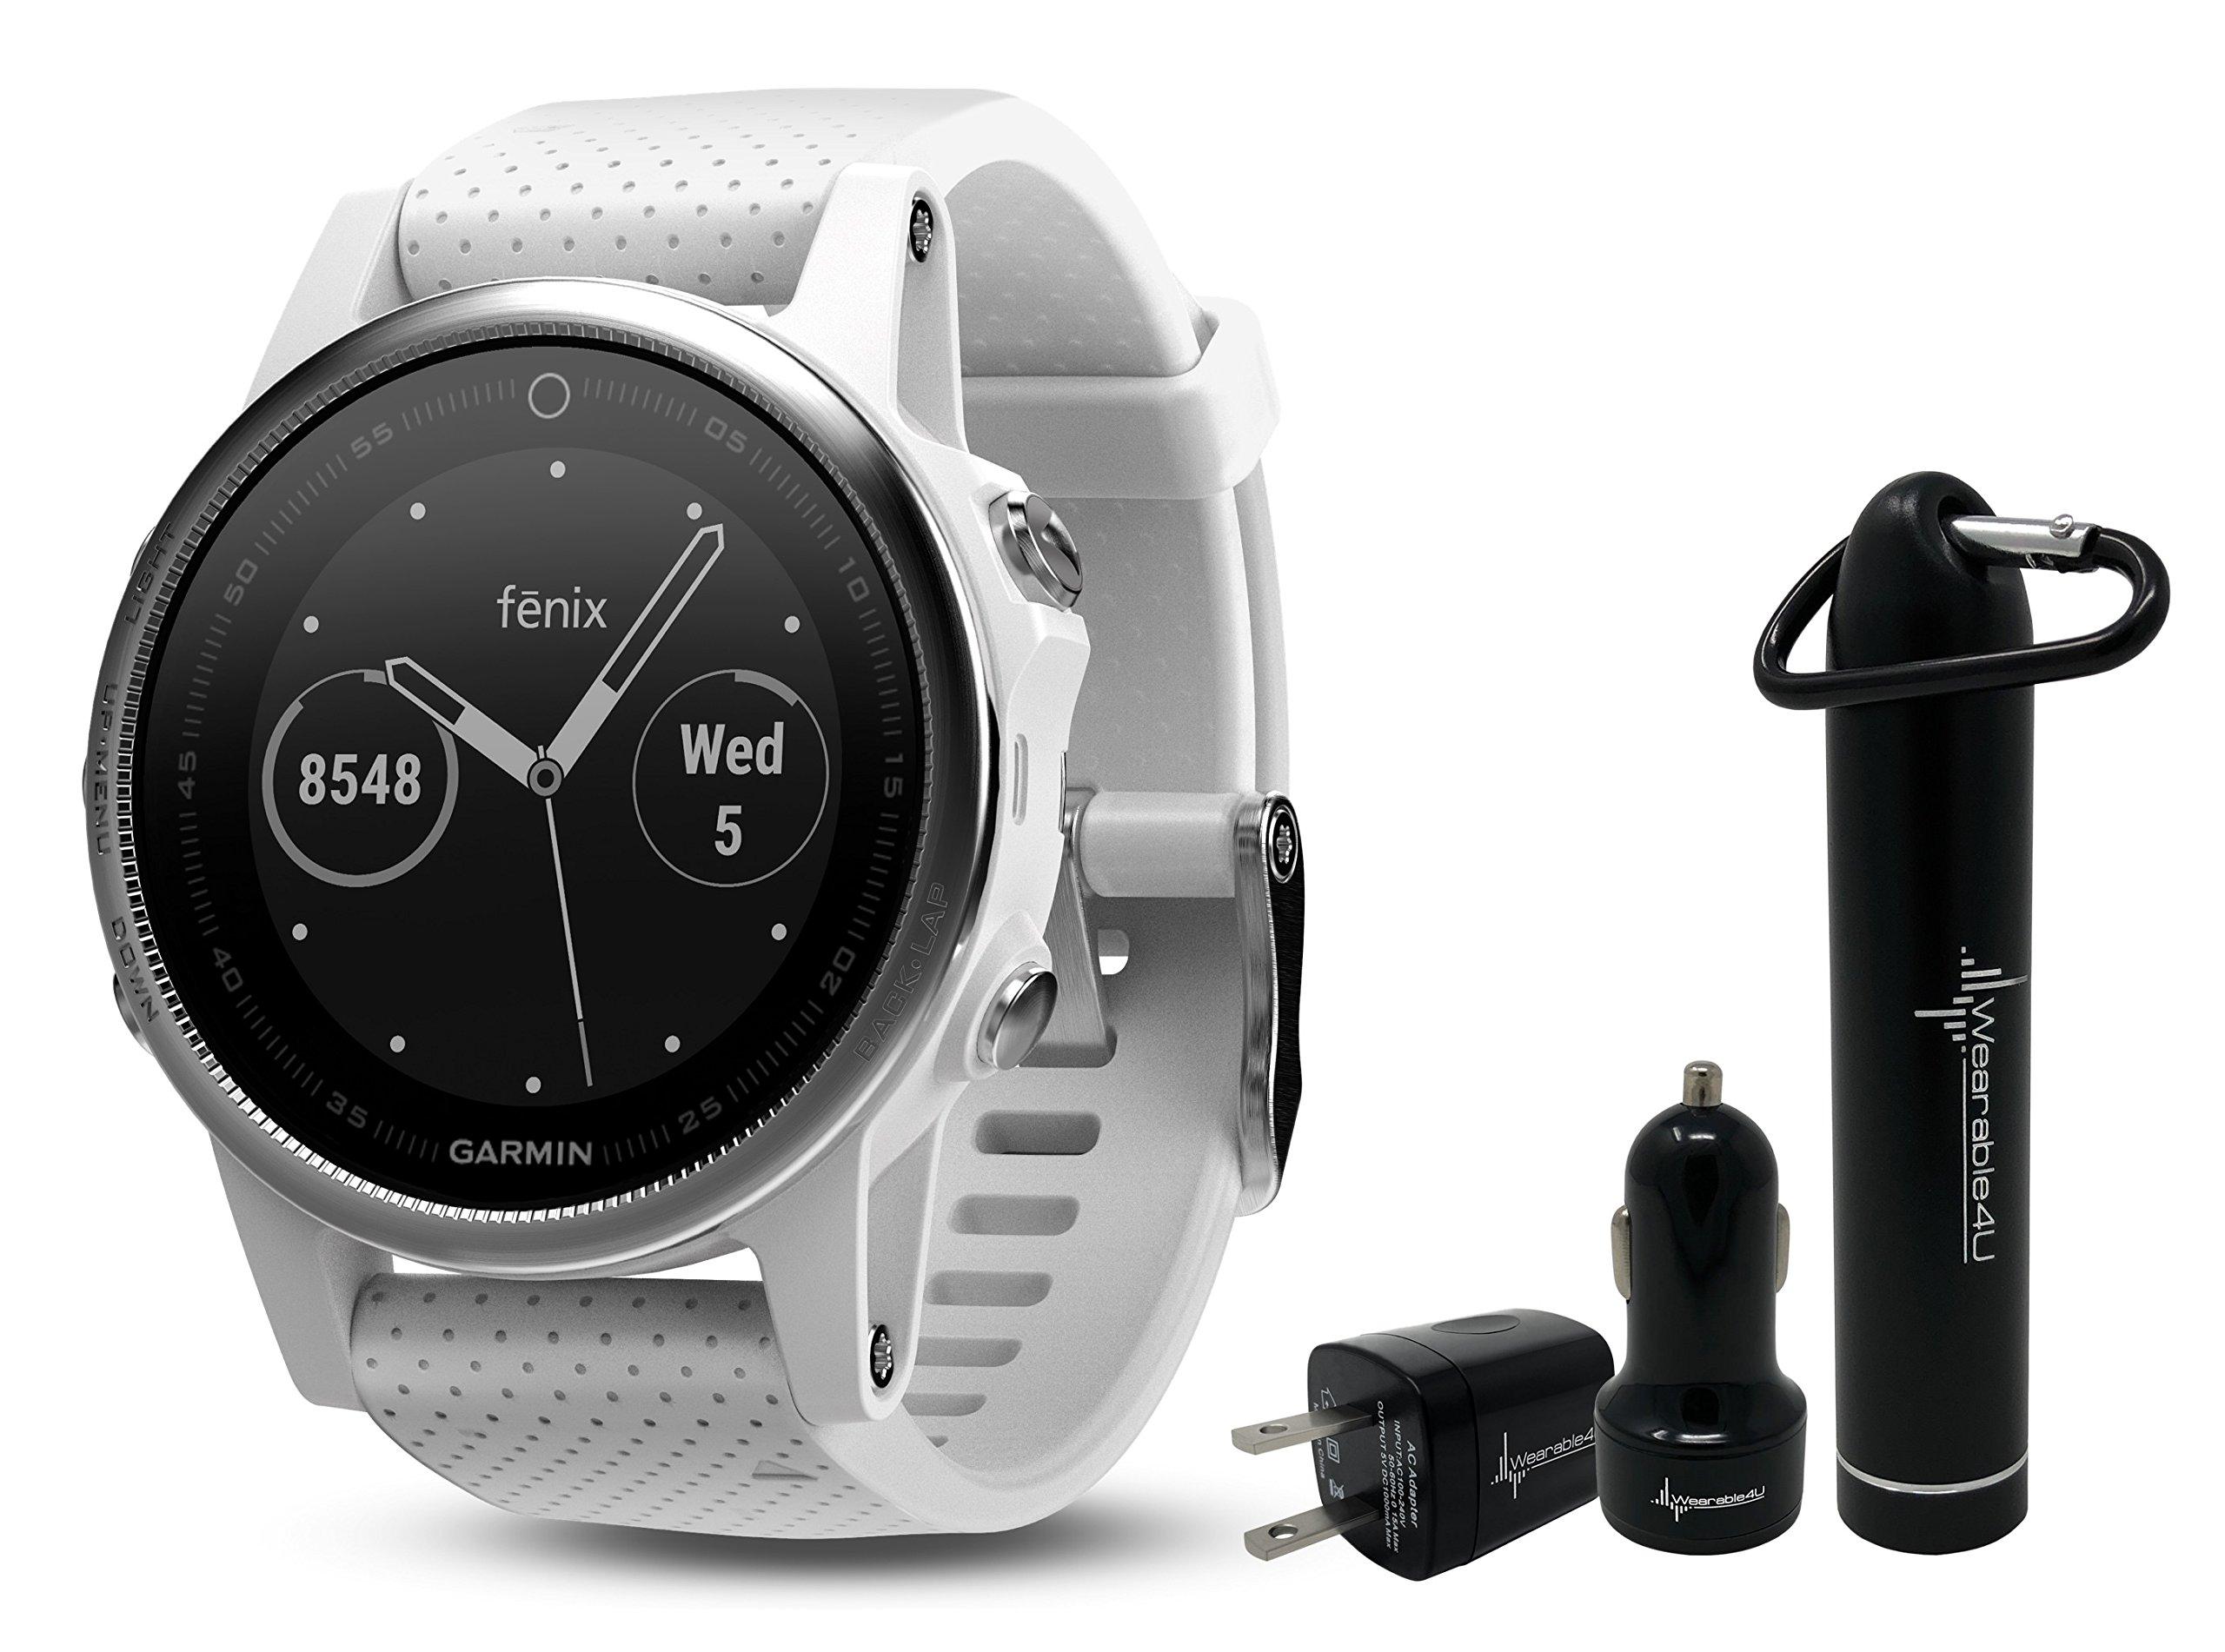 Garmin Fenix 5S Premium GPS Multisport Watch Ultimate Power Bundle | Includes Garmin Fenix 5S Watch (42mm), Wearable4U Power Bank, and Wearable4U Car and Wall USB Charging Adapters |